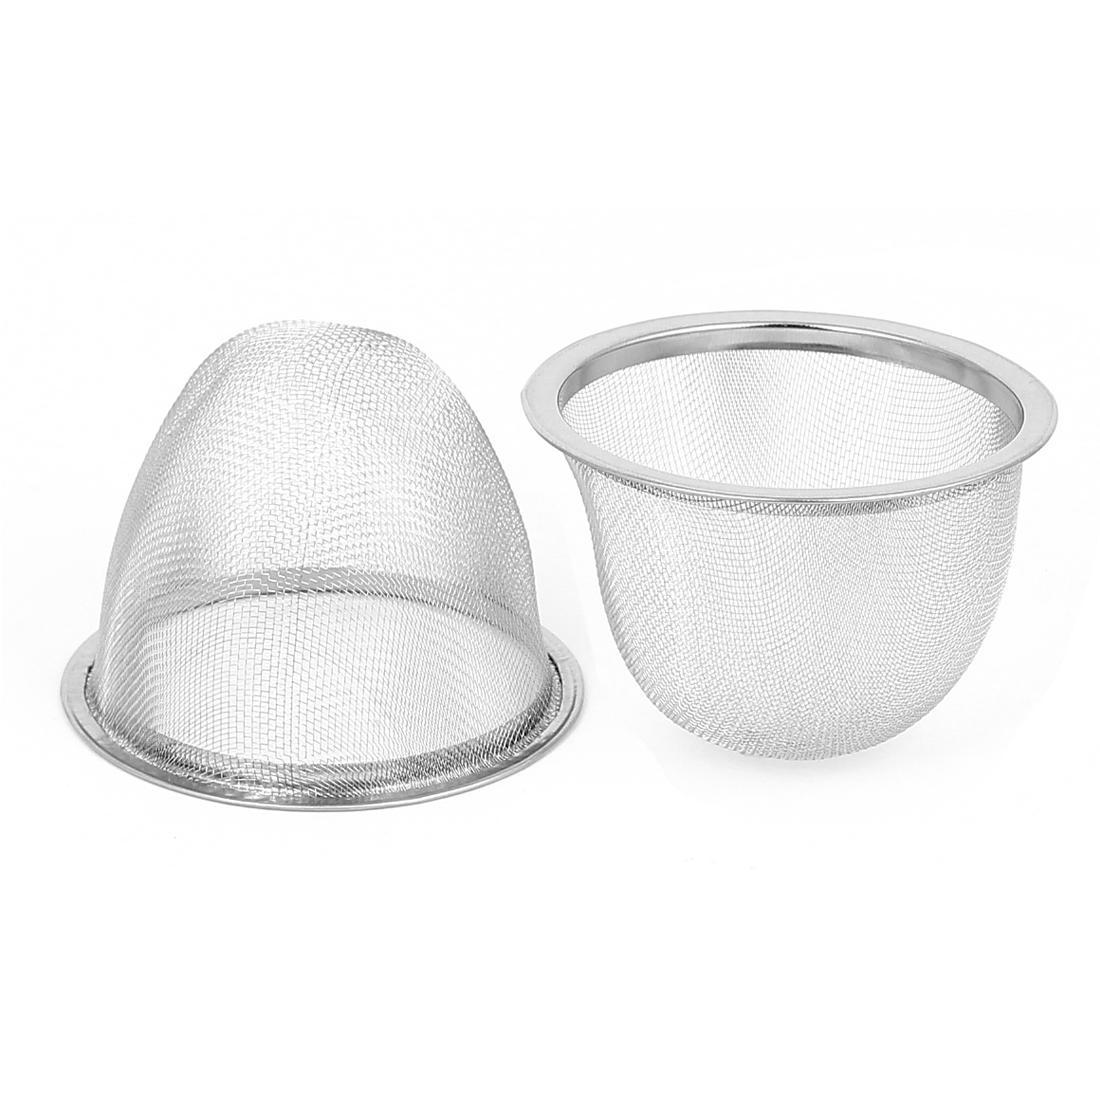 Household Metal Mesh Net Basket Tea Leaves Spice Strainer Teapot Filter 70mm Dia 2pcs